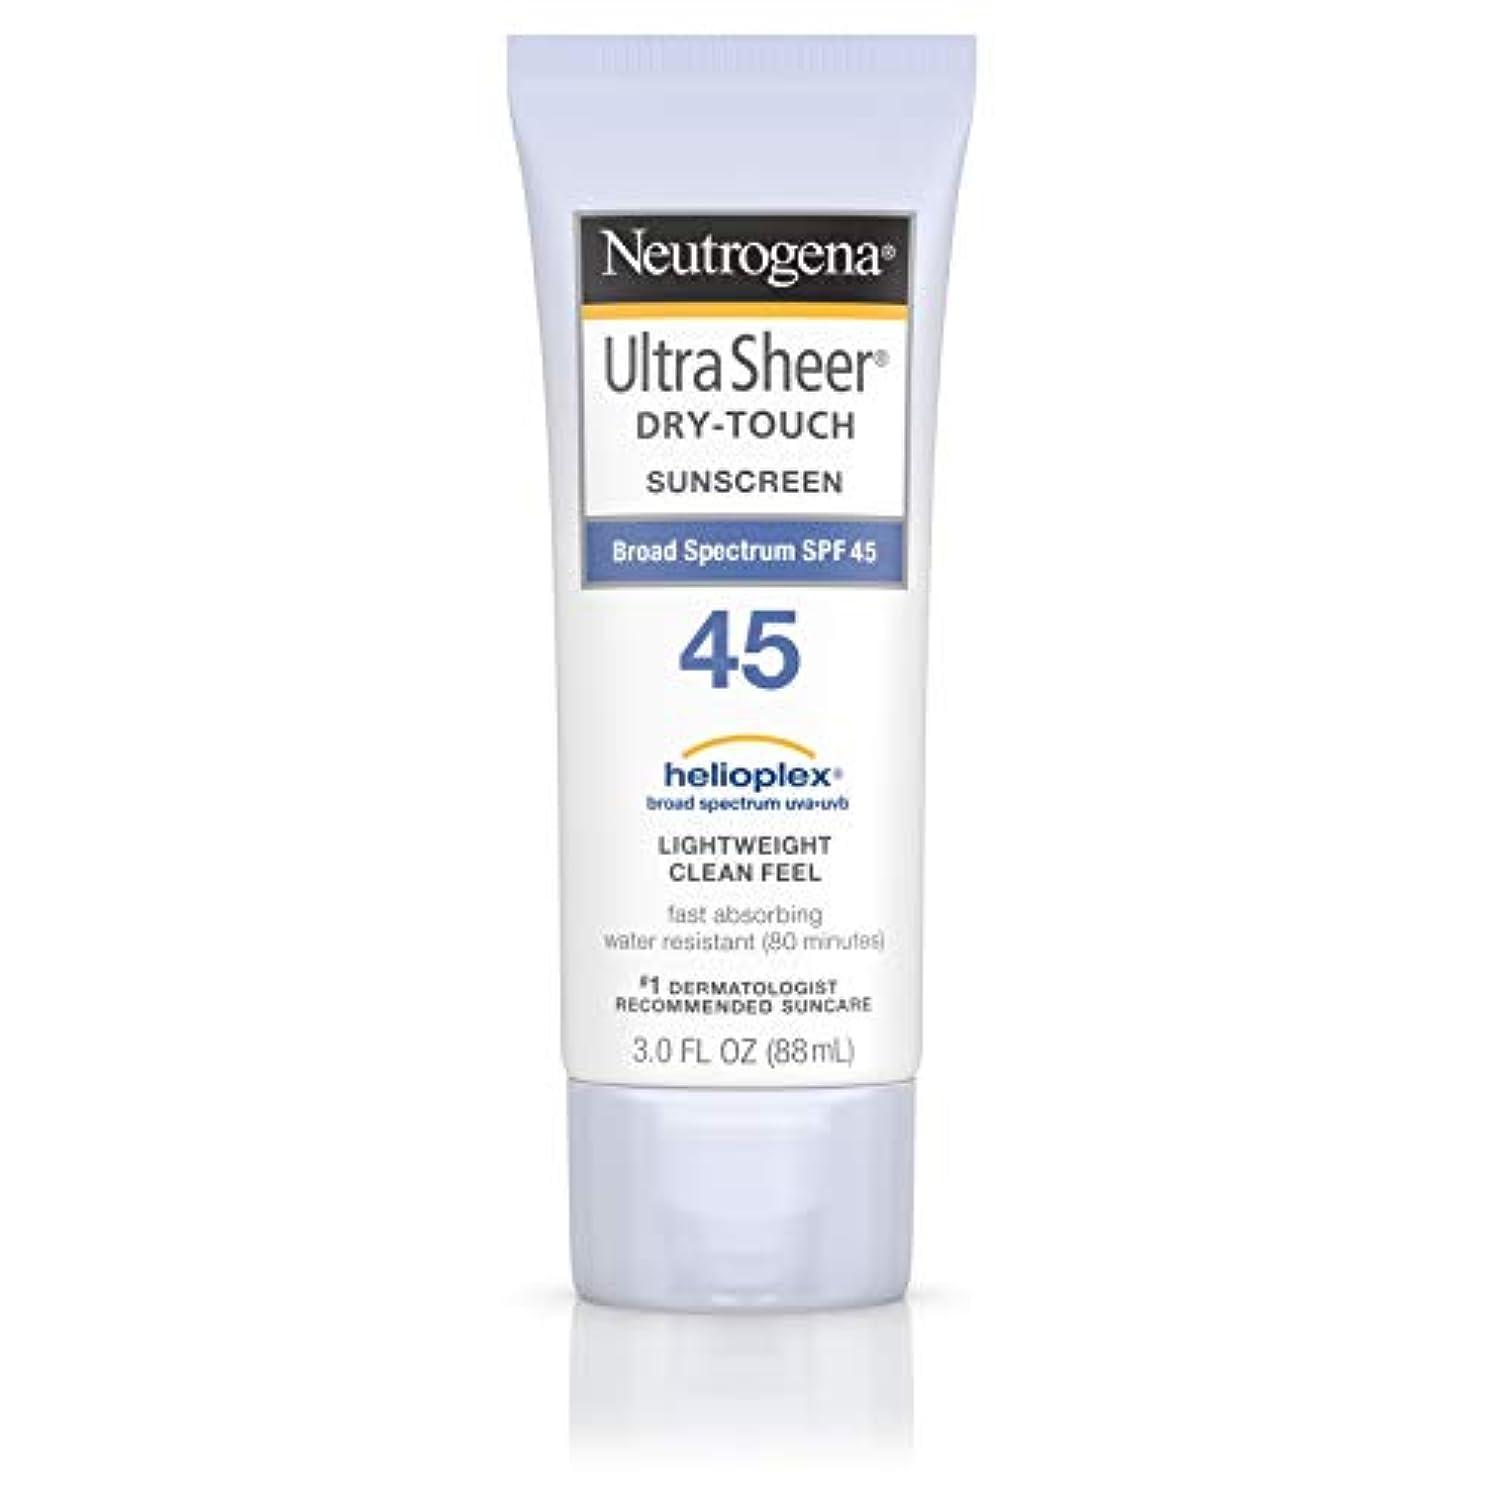 パーツ心理的意見Neutrogena Ultra Sheer dry-touch Sunscreen Broad Spectrum